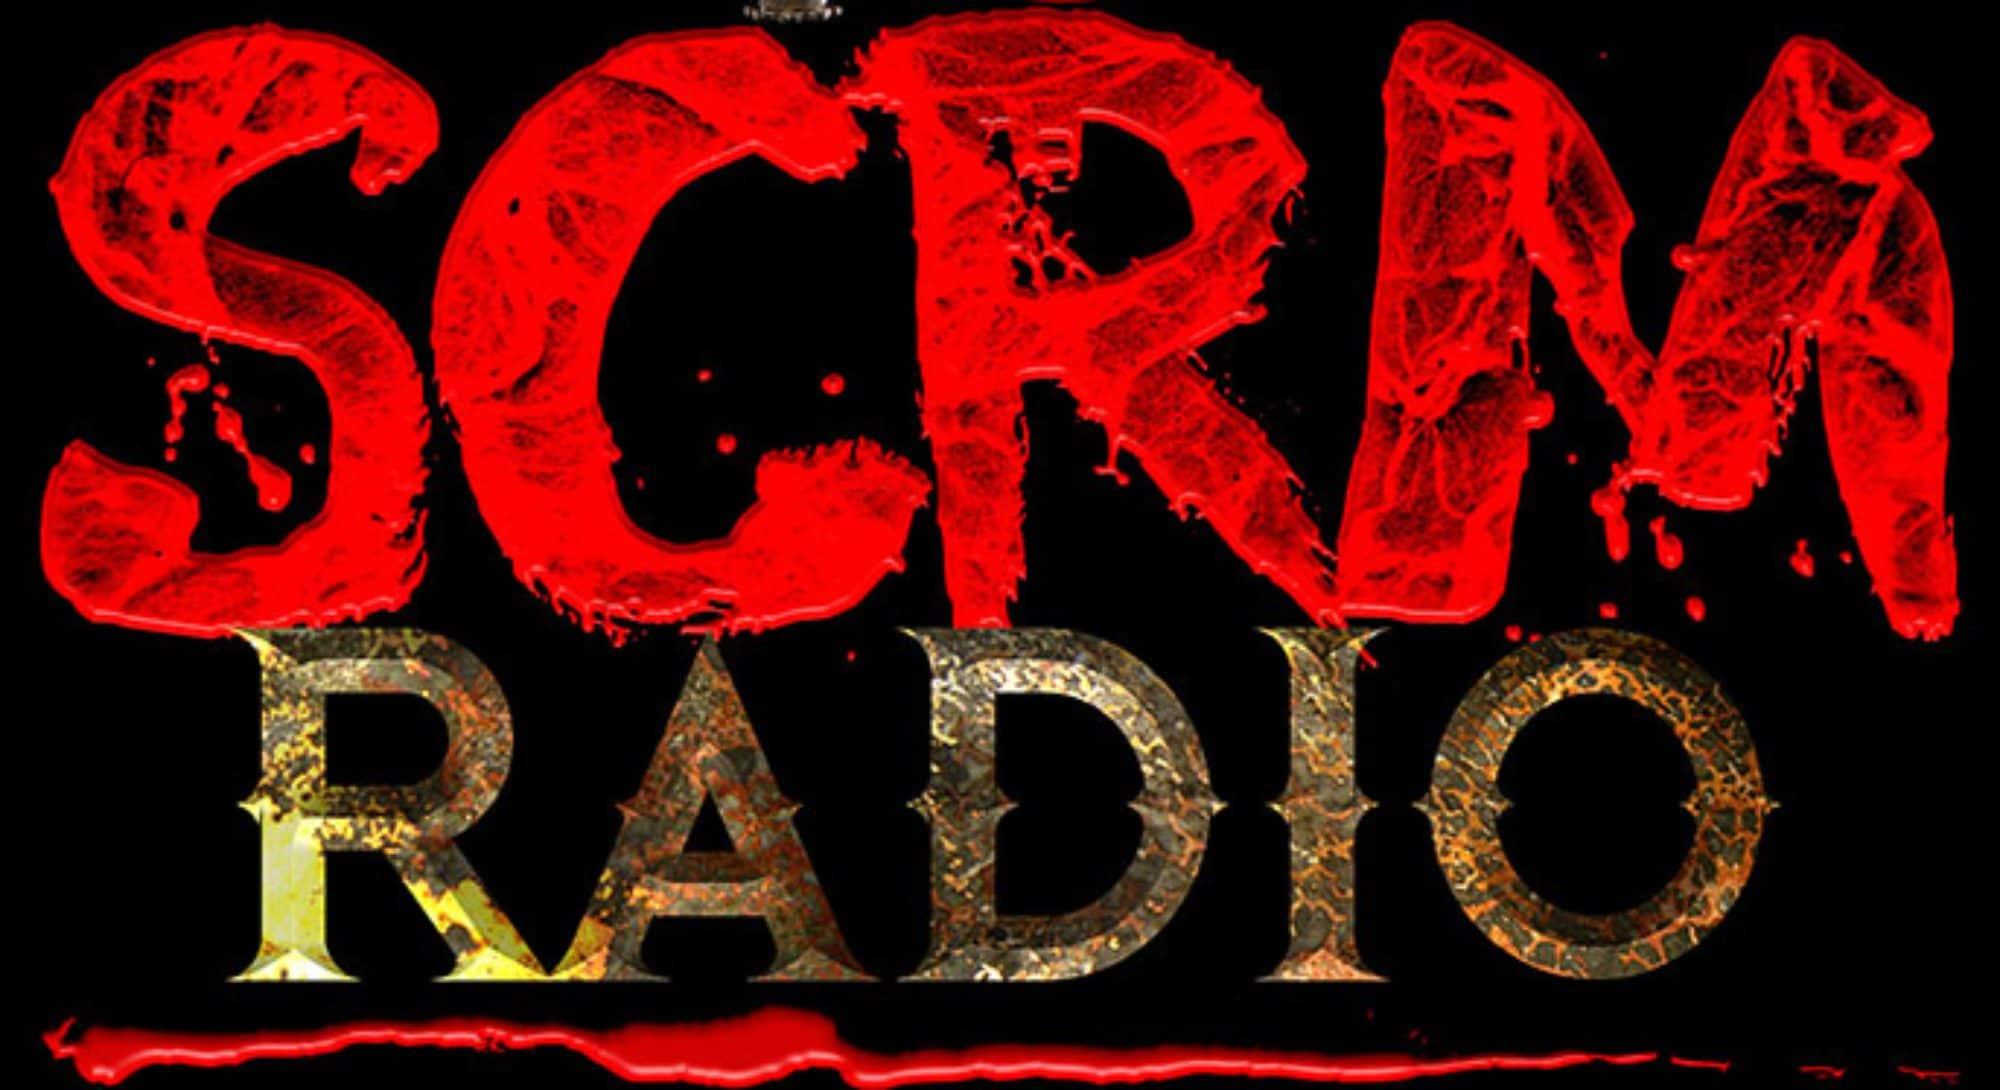 THEATER OF TERROR on SCRM Radio